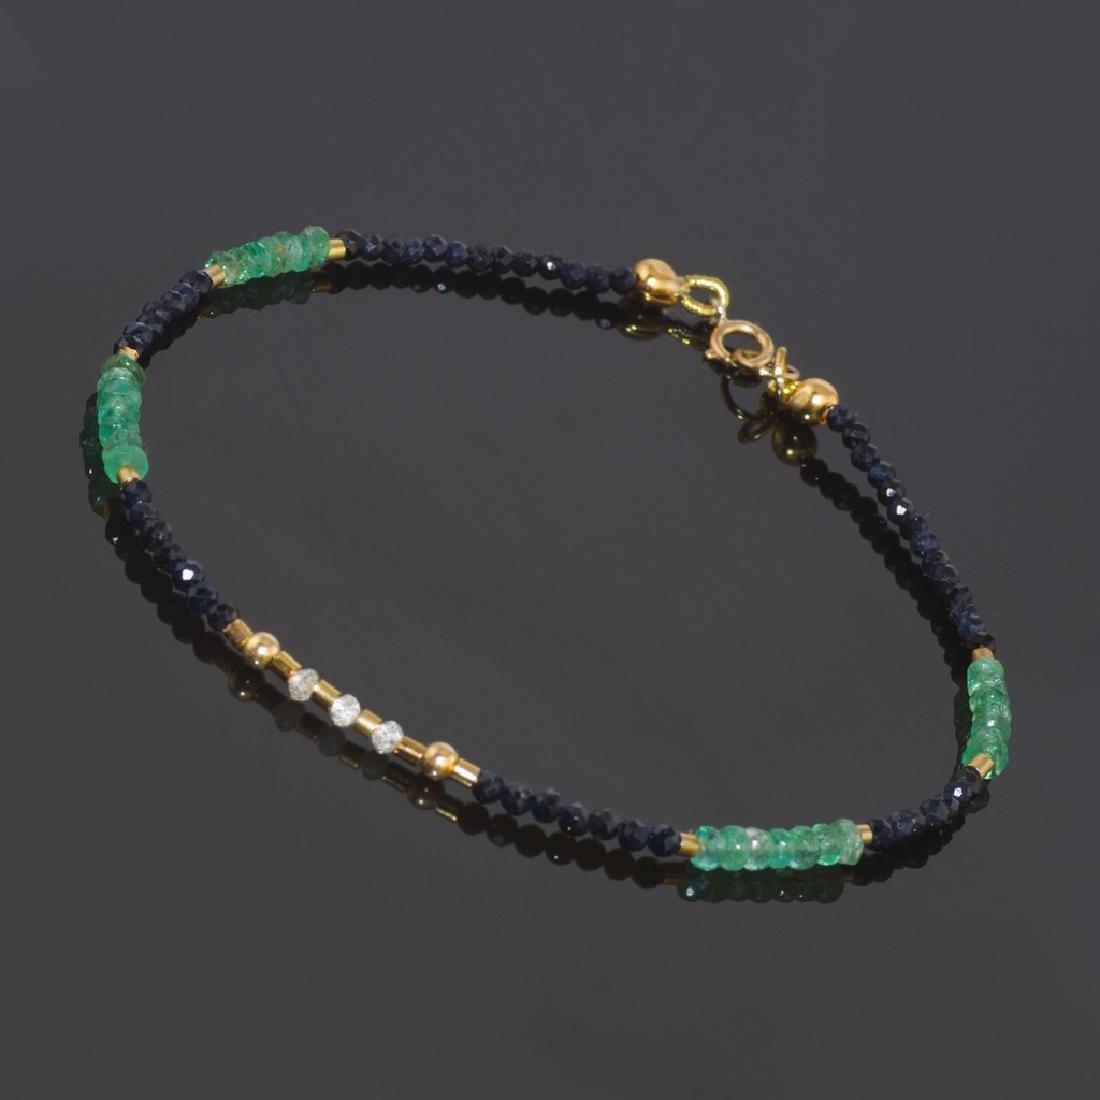 Sapphire and Emerald bracelet with Diamonds 0.2 carat - 2